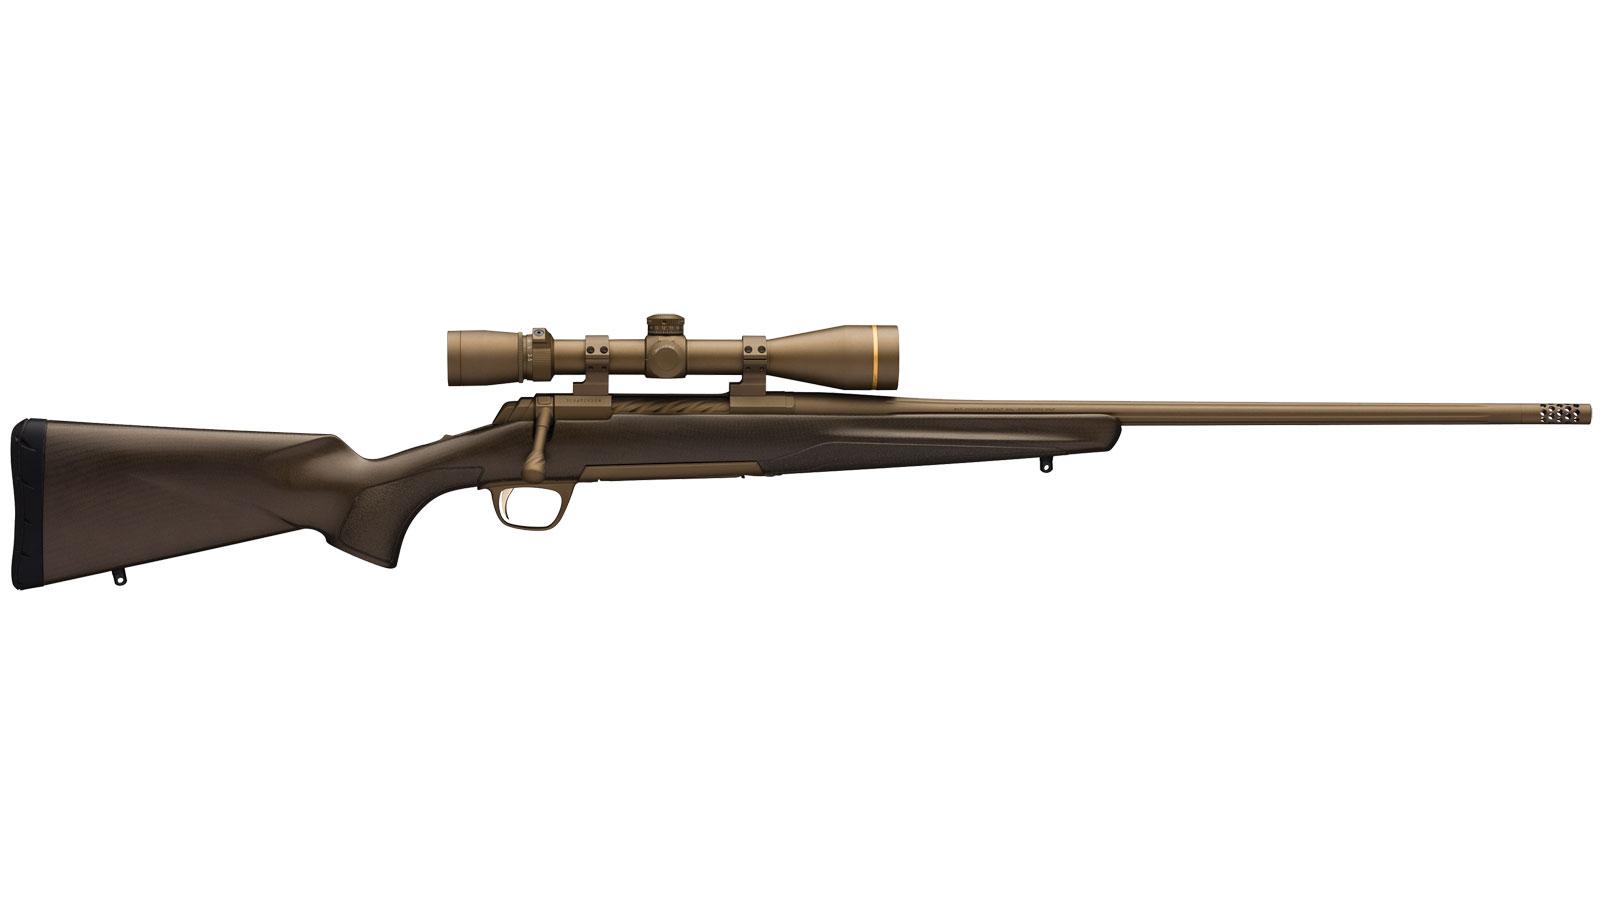 Browning 035418226 X-Bolt Pro Bolt 30-06 Springfield 22 3+1 Carbon Fiber Burnt Bronze Cerakote Stk Burnt Bronze Cerakote in.